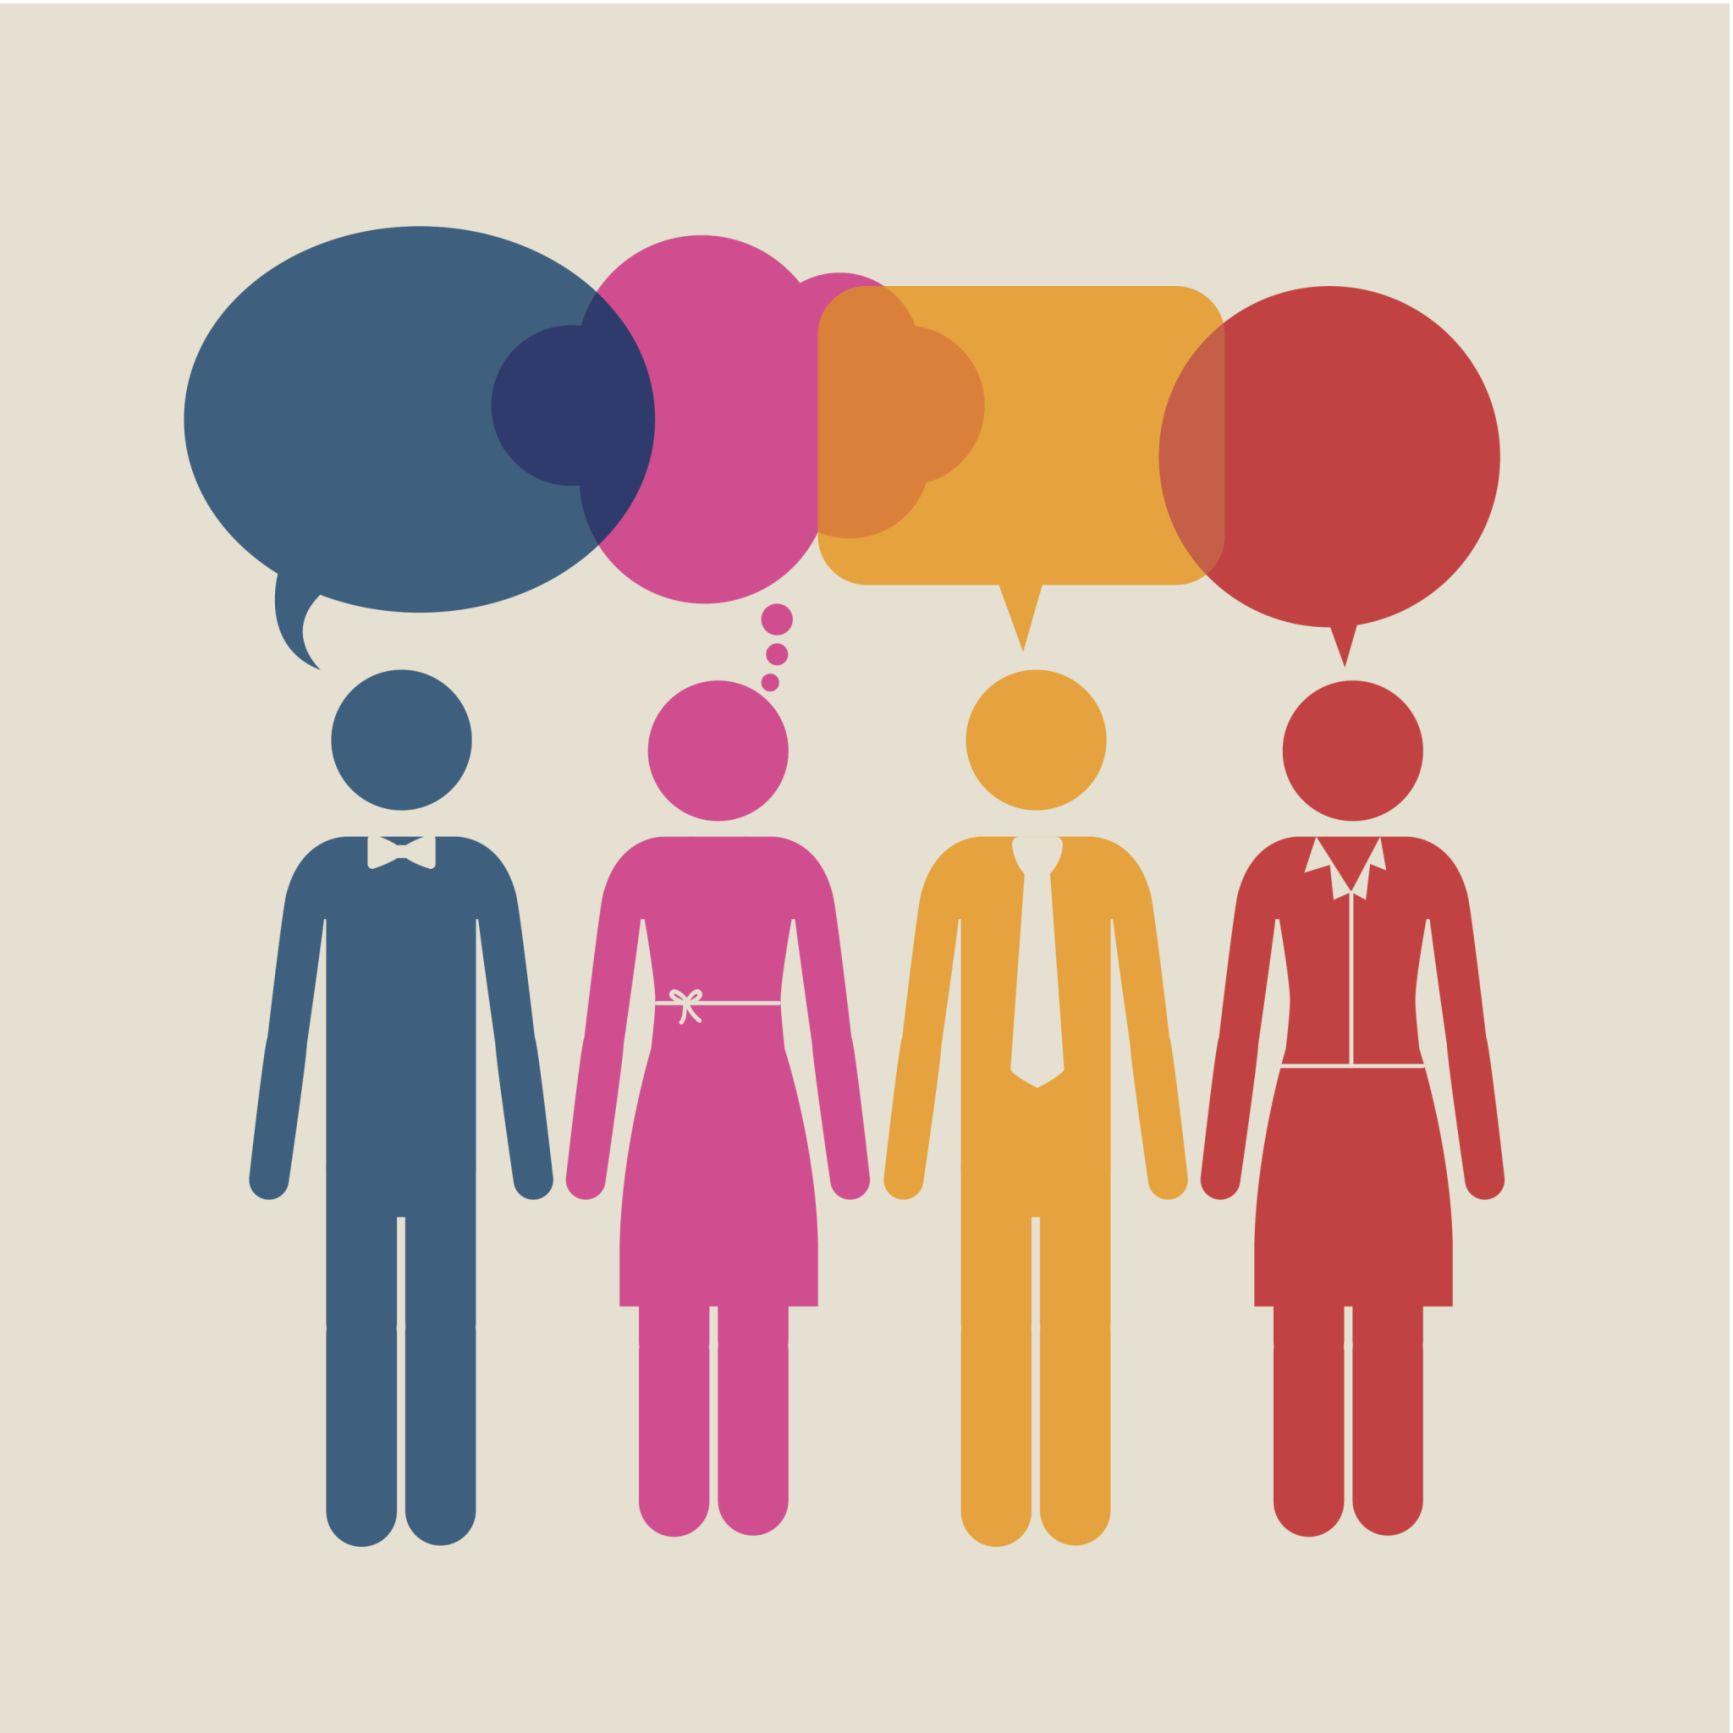 how to speak like a woman